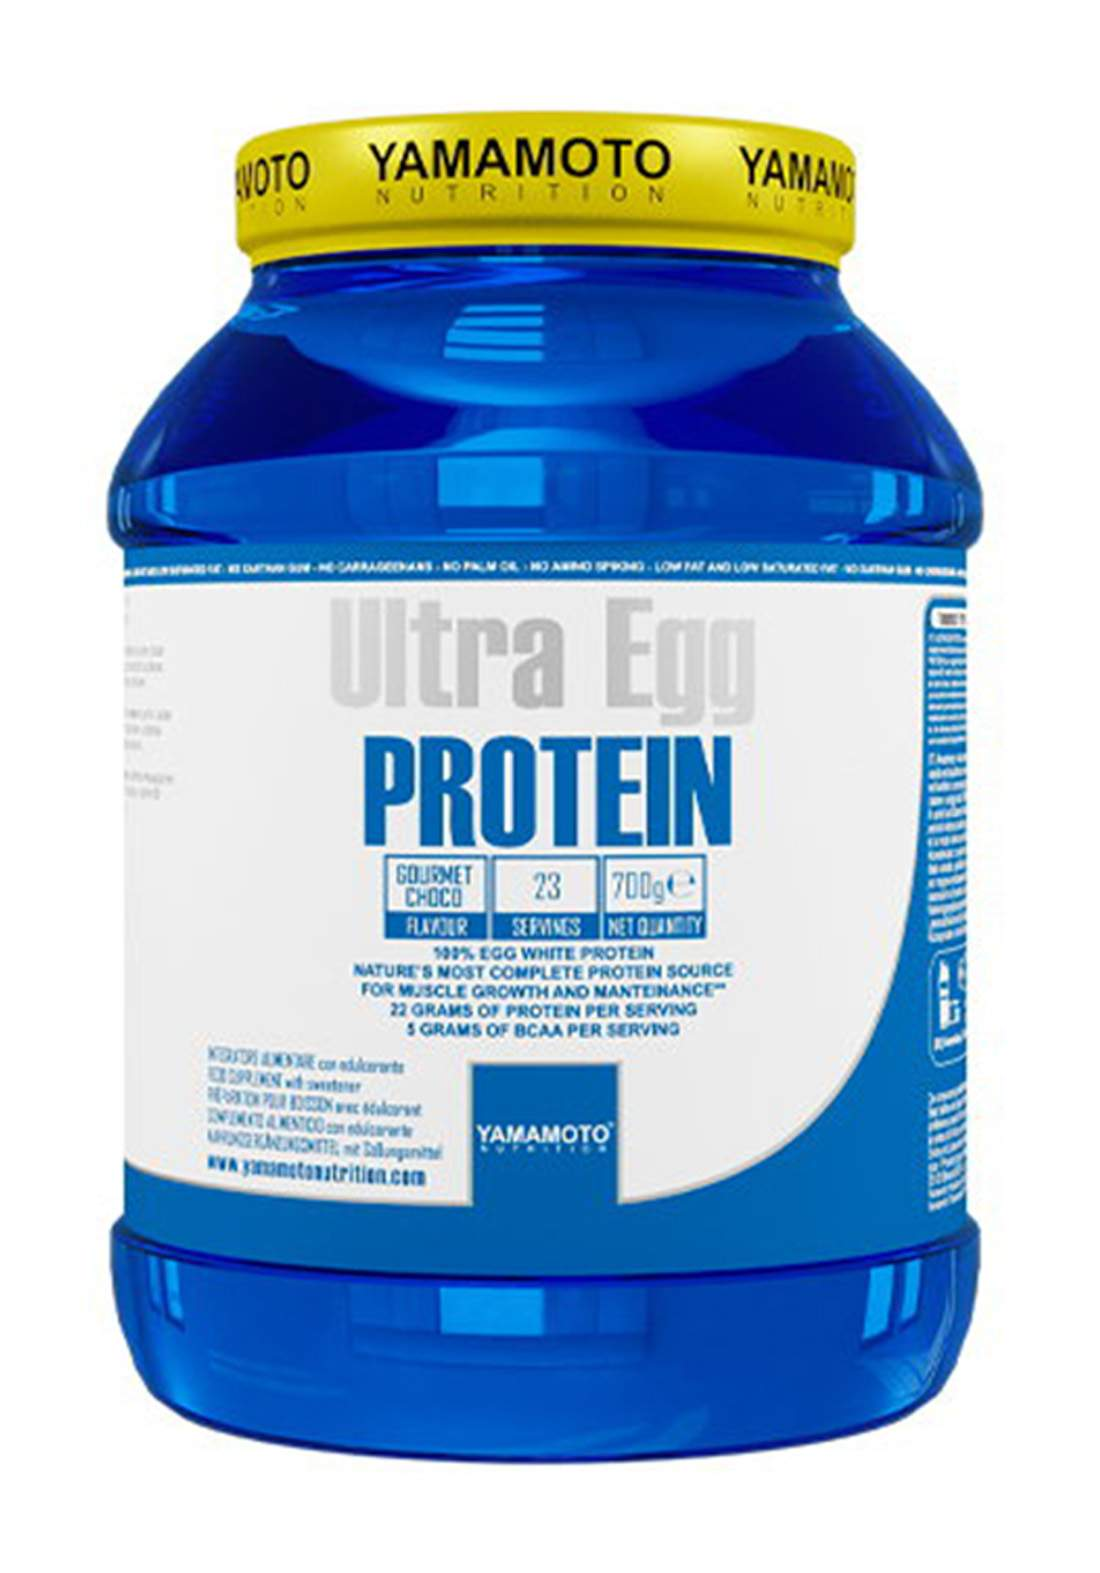 Yamamoto Ultra Egg Protein 700g بروتين البيض